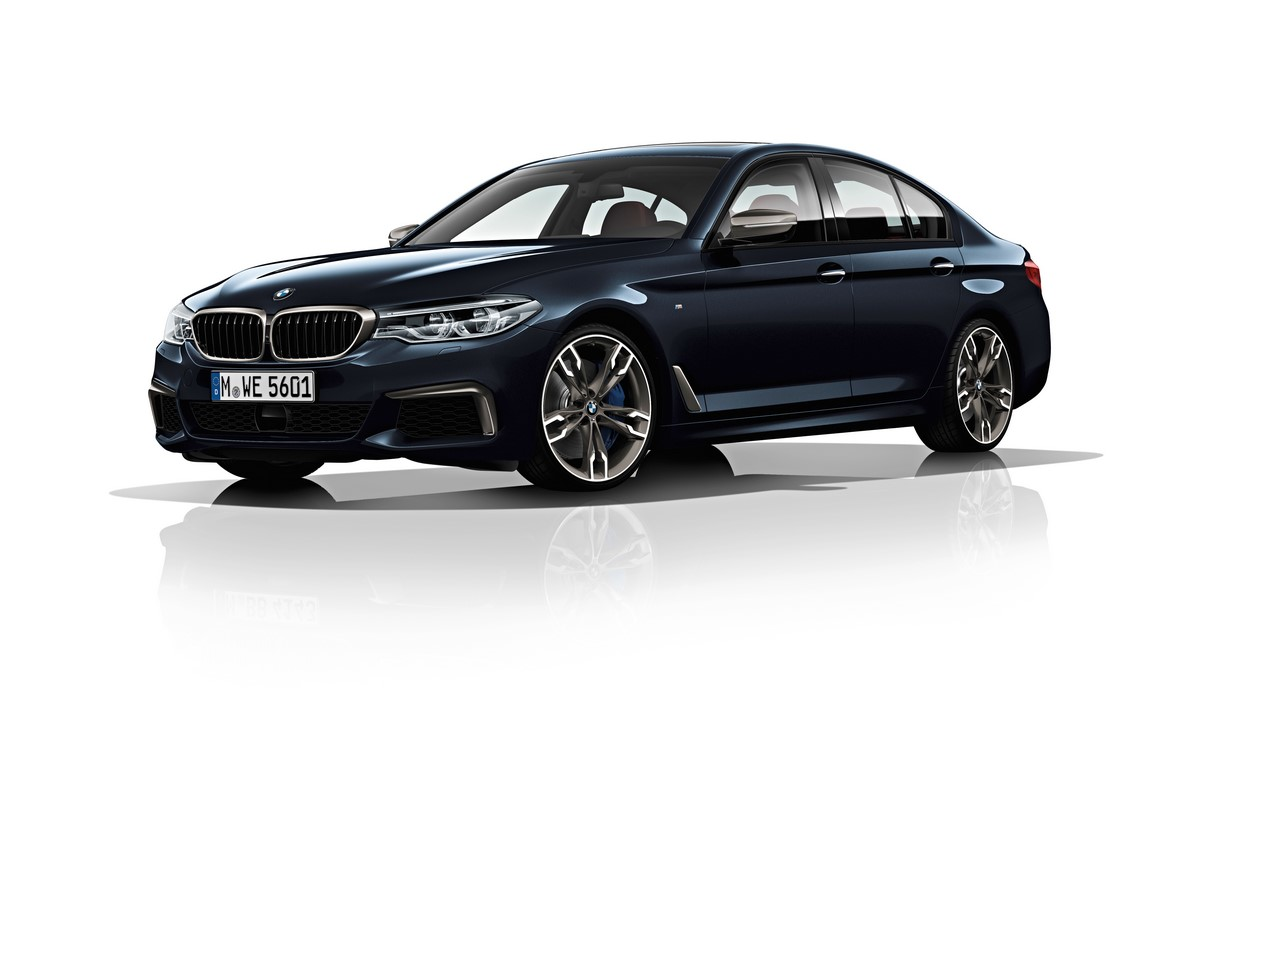 2017 BMW 5 Series M550i xDrive front three quarters